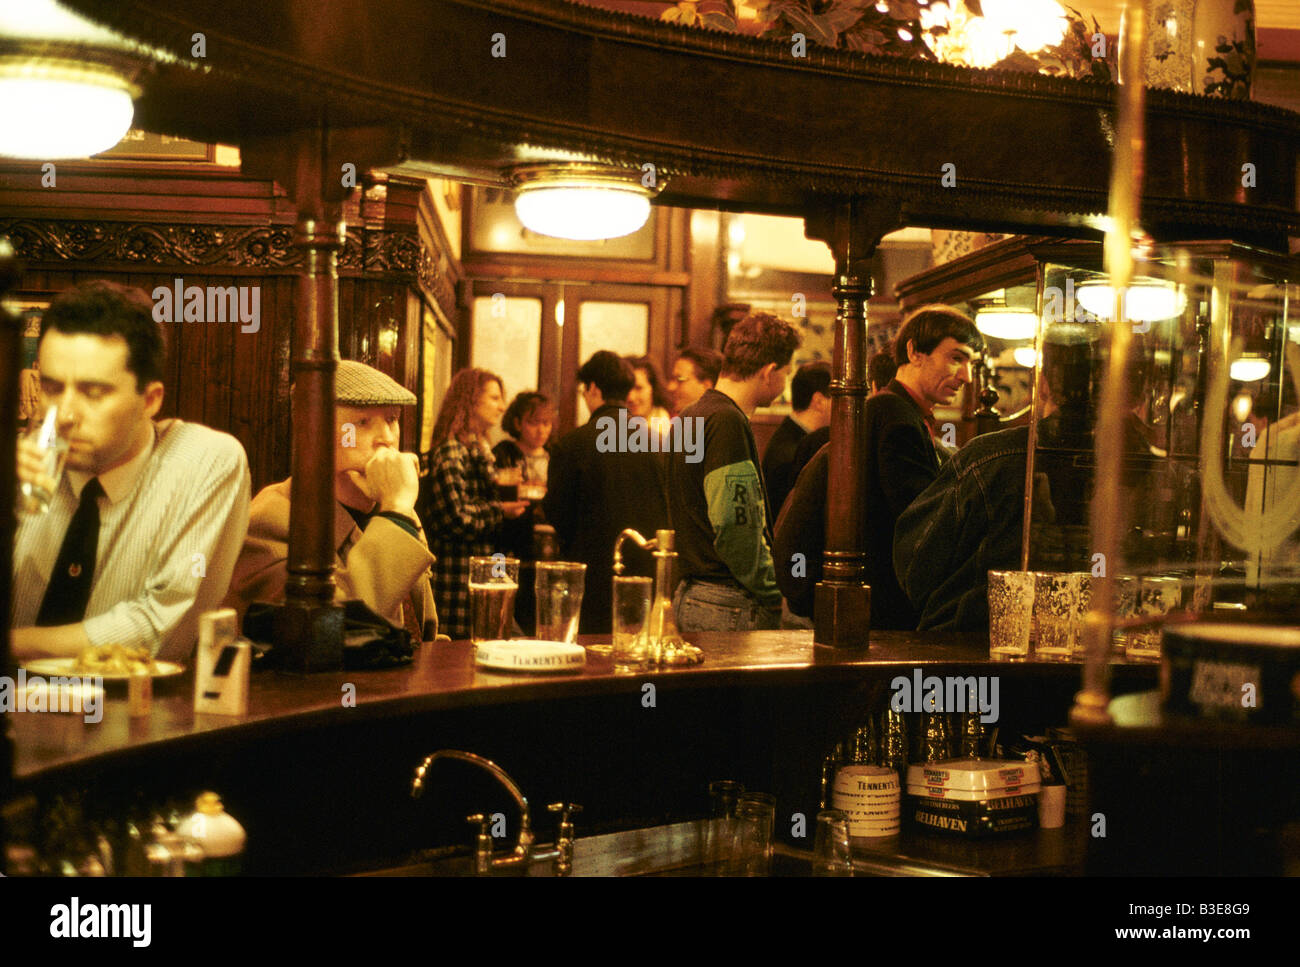 PUB SCENE IN GLASGOW KINGS ARMS MEN AT BAR 1992 - Stock Image